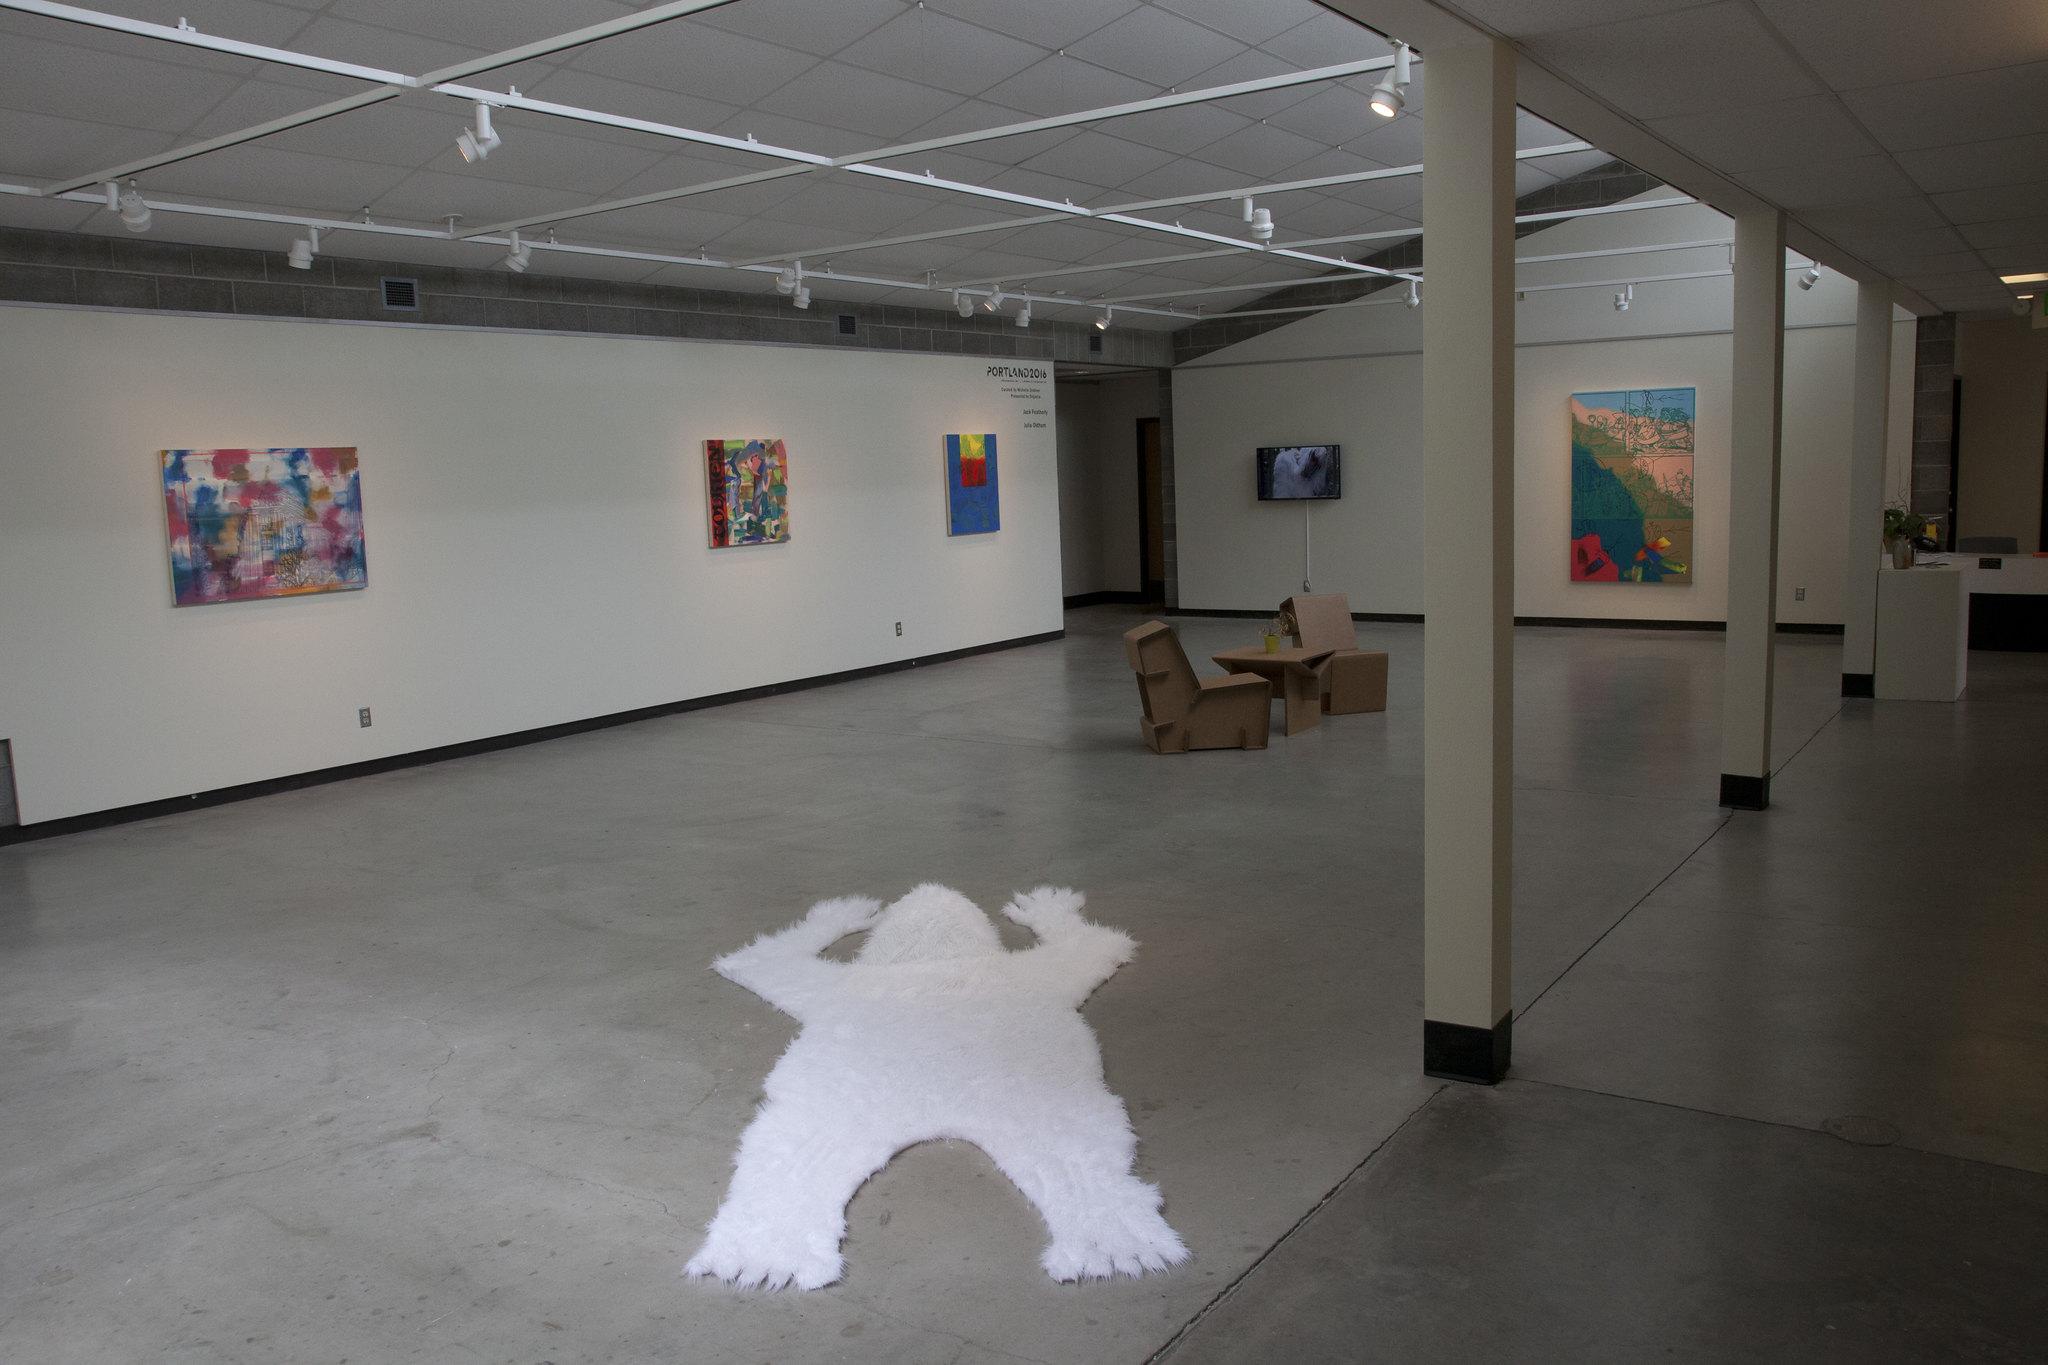 Installation at the Royal Nebeker Art Gallery, Clatsop Community College, Astoria